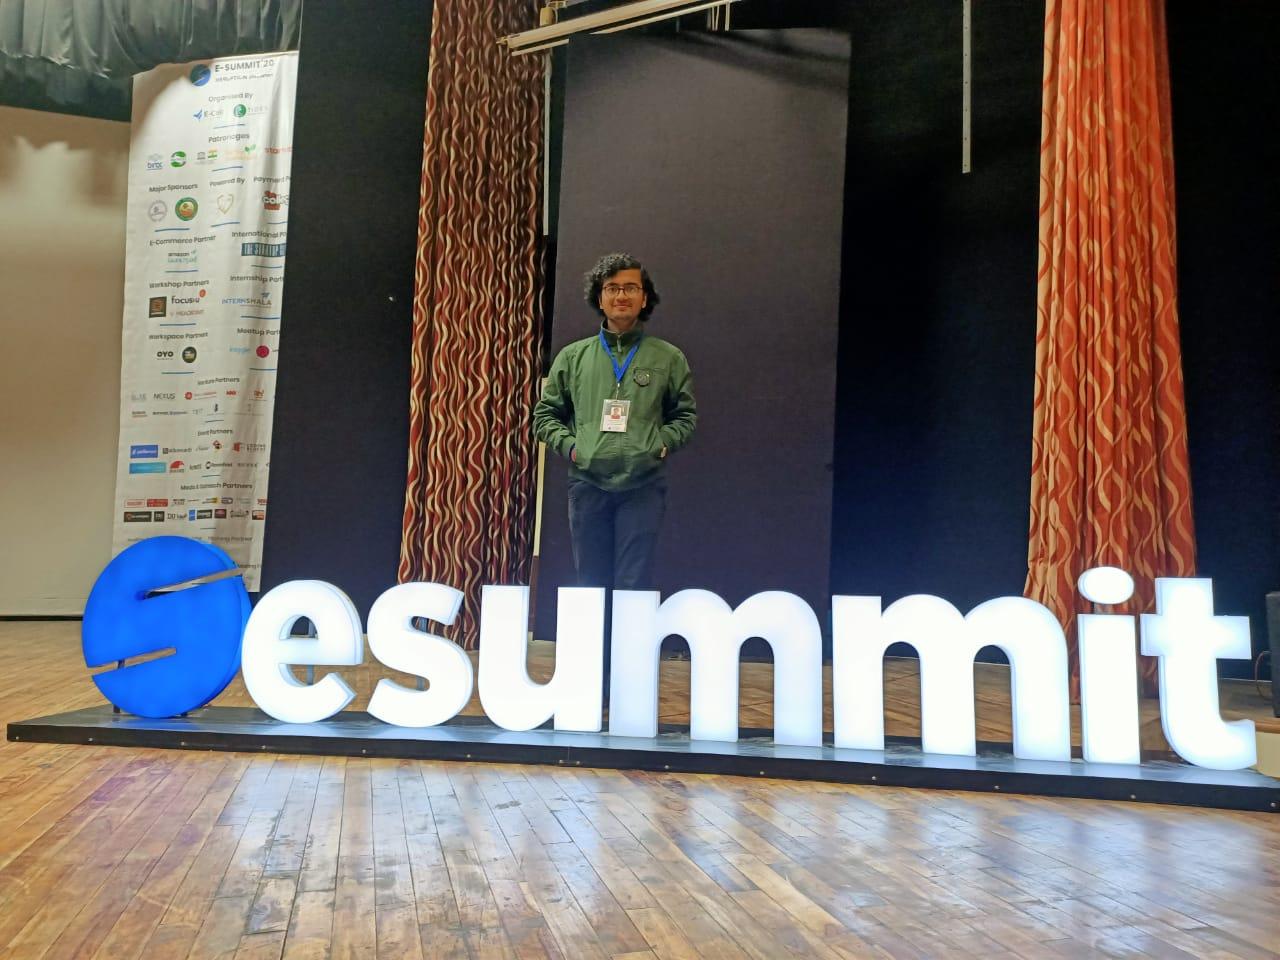 iit,roorkee, shiv sangal, investor, investment, supply chain, logistics, e-summit, 2020, abhishek prabhuda, hanson hu, venture capitalist,